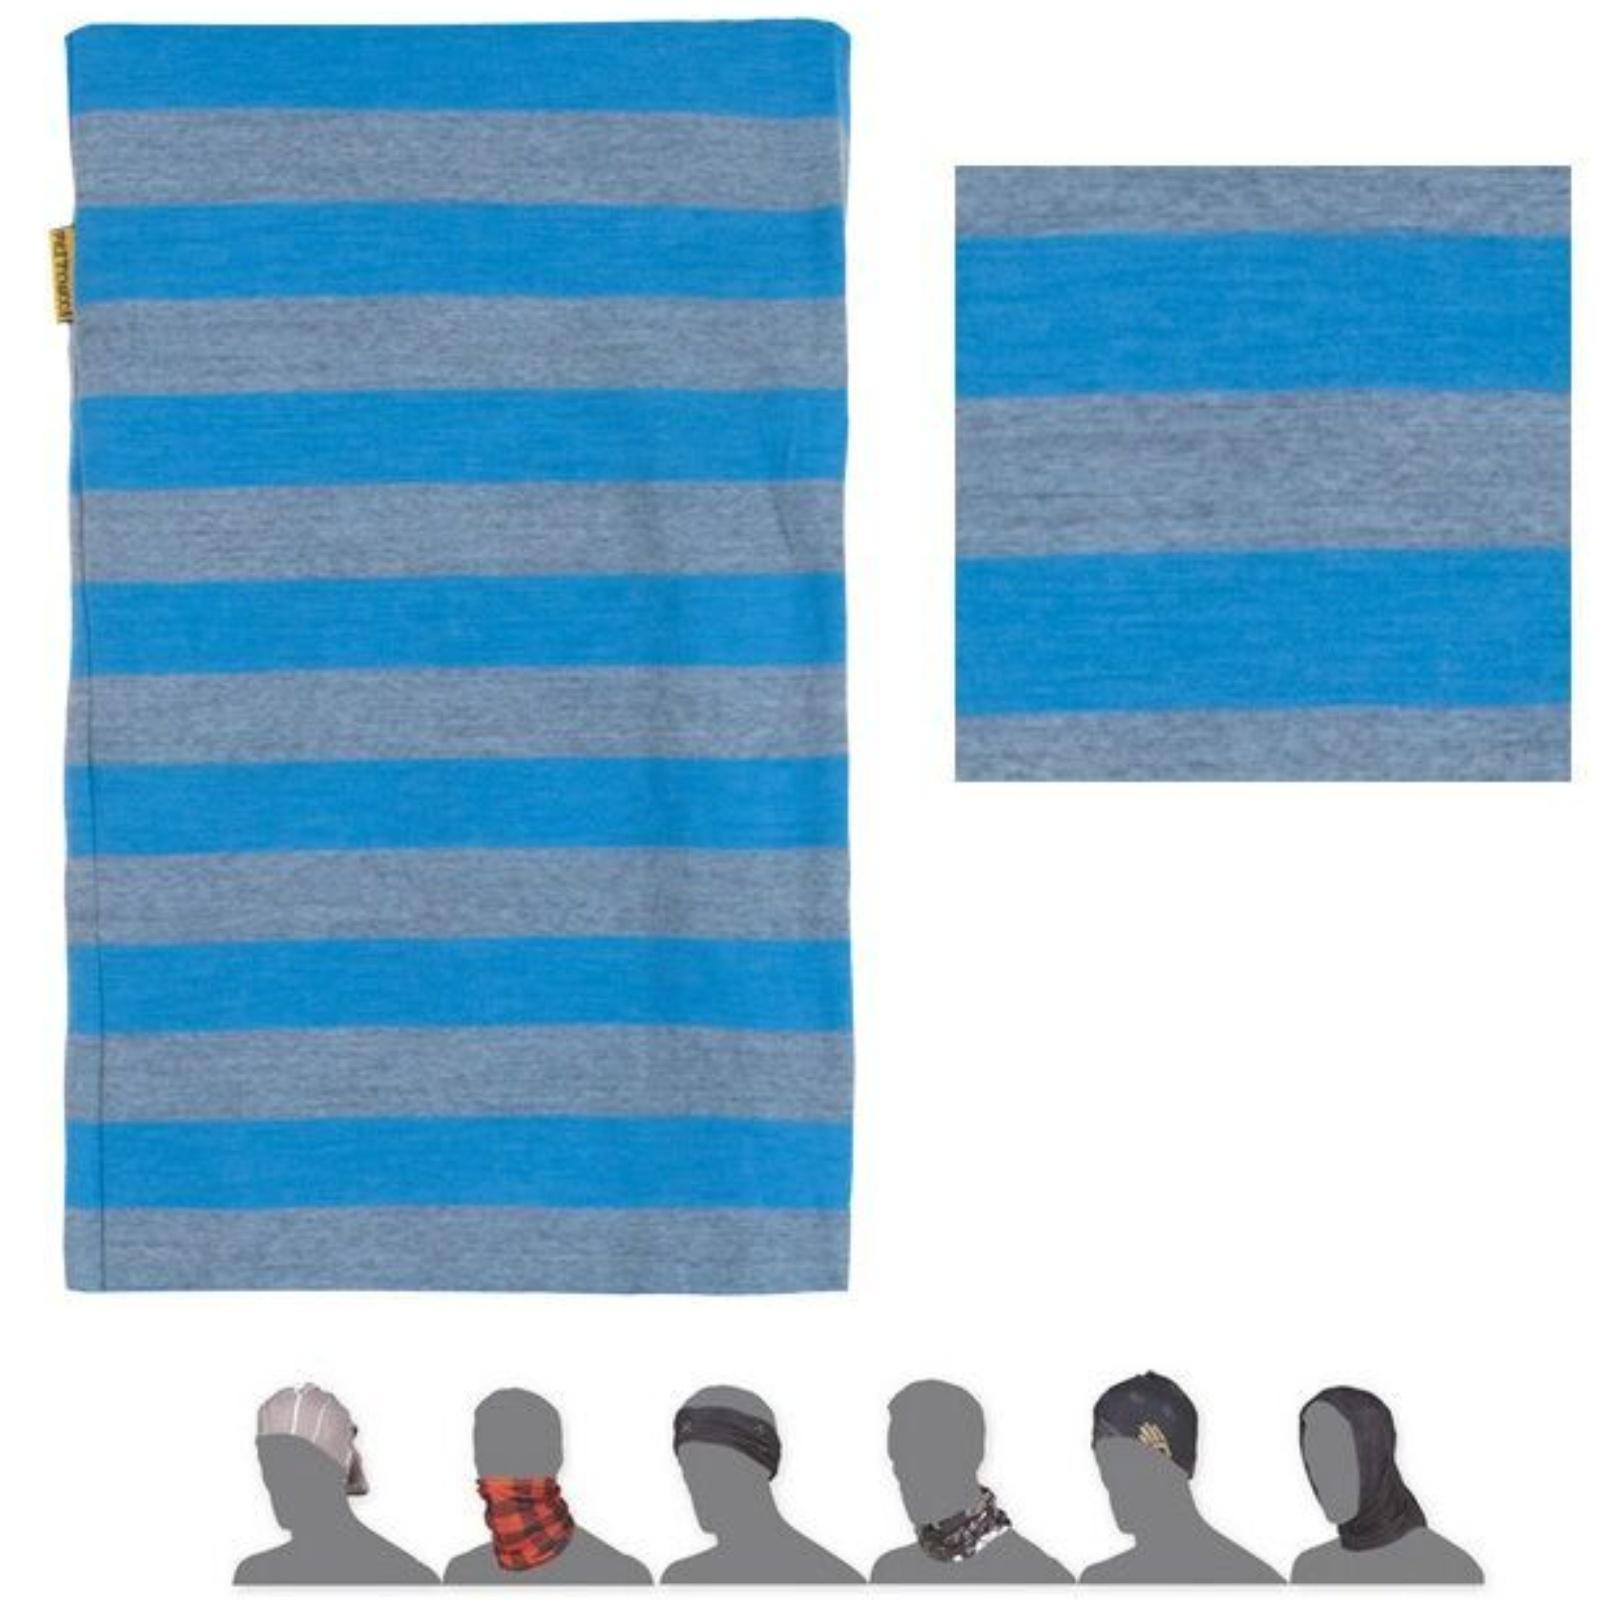 Sensor šátek Tube Merino Wool